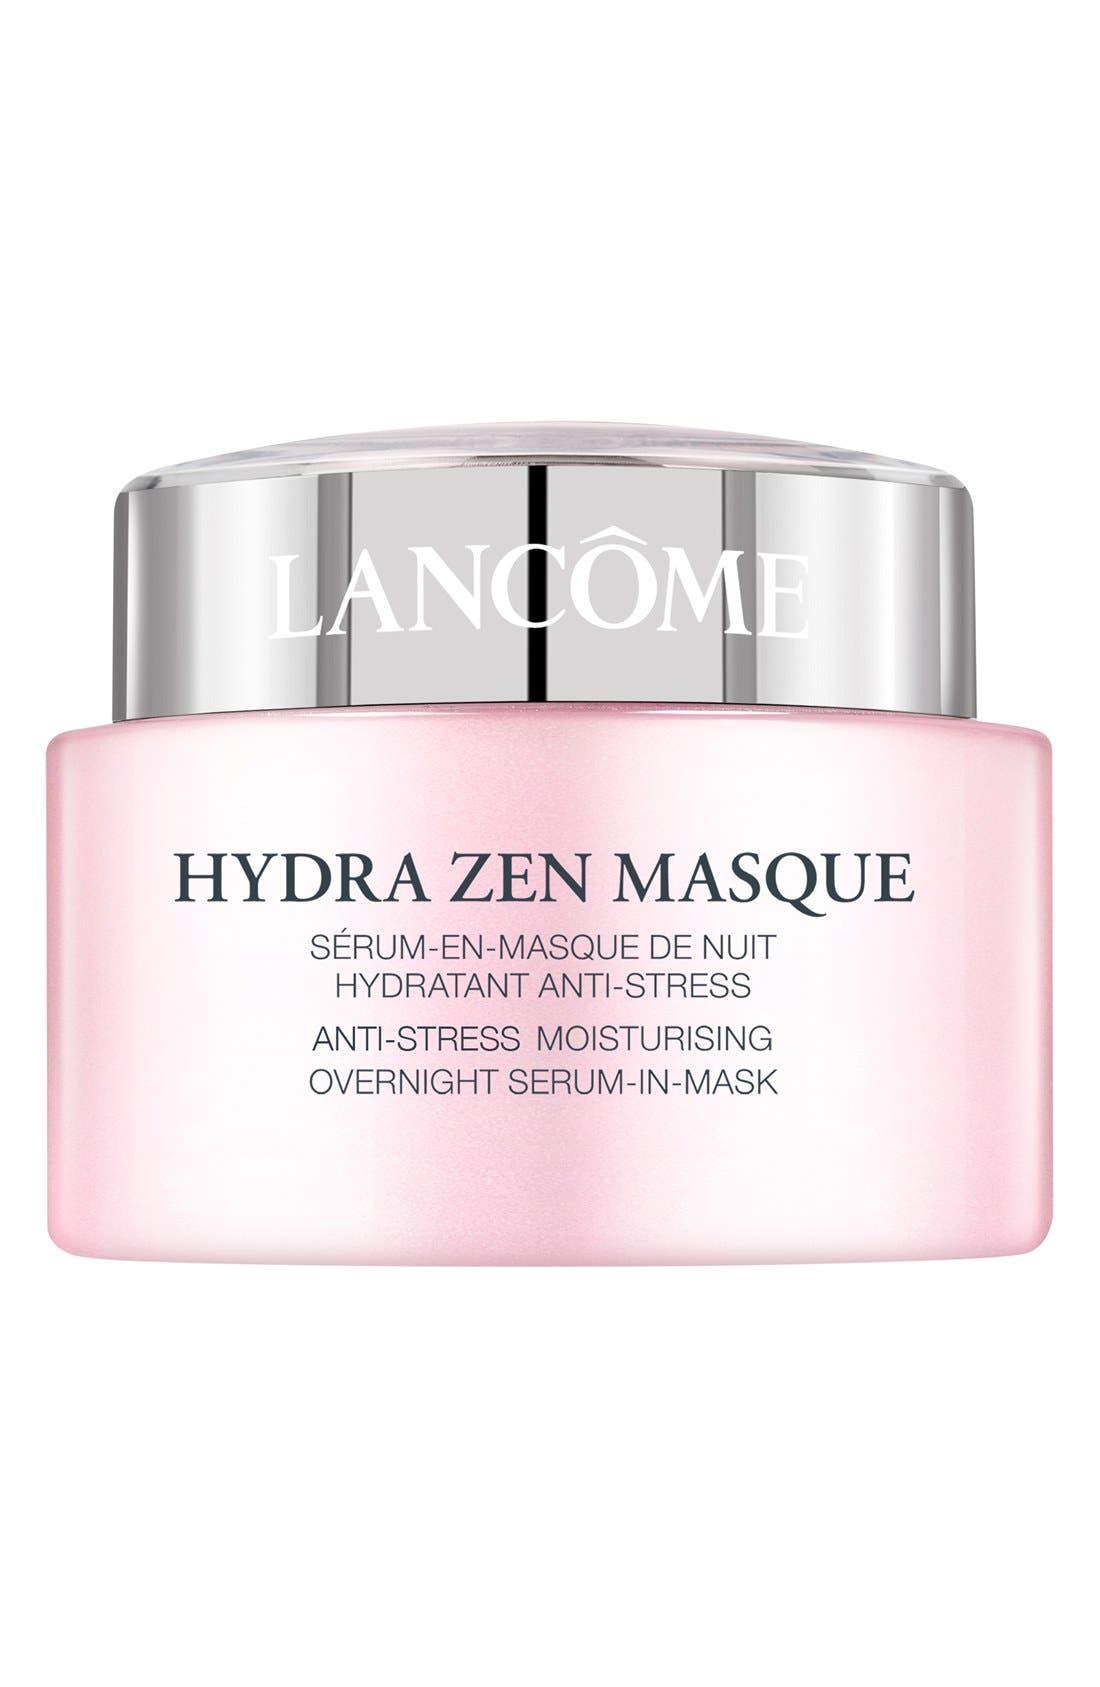 Lancôme Hydra Zen Anti-Stress Moisturizing Overnight Serum-in-Mask